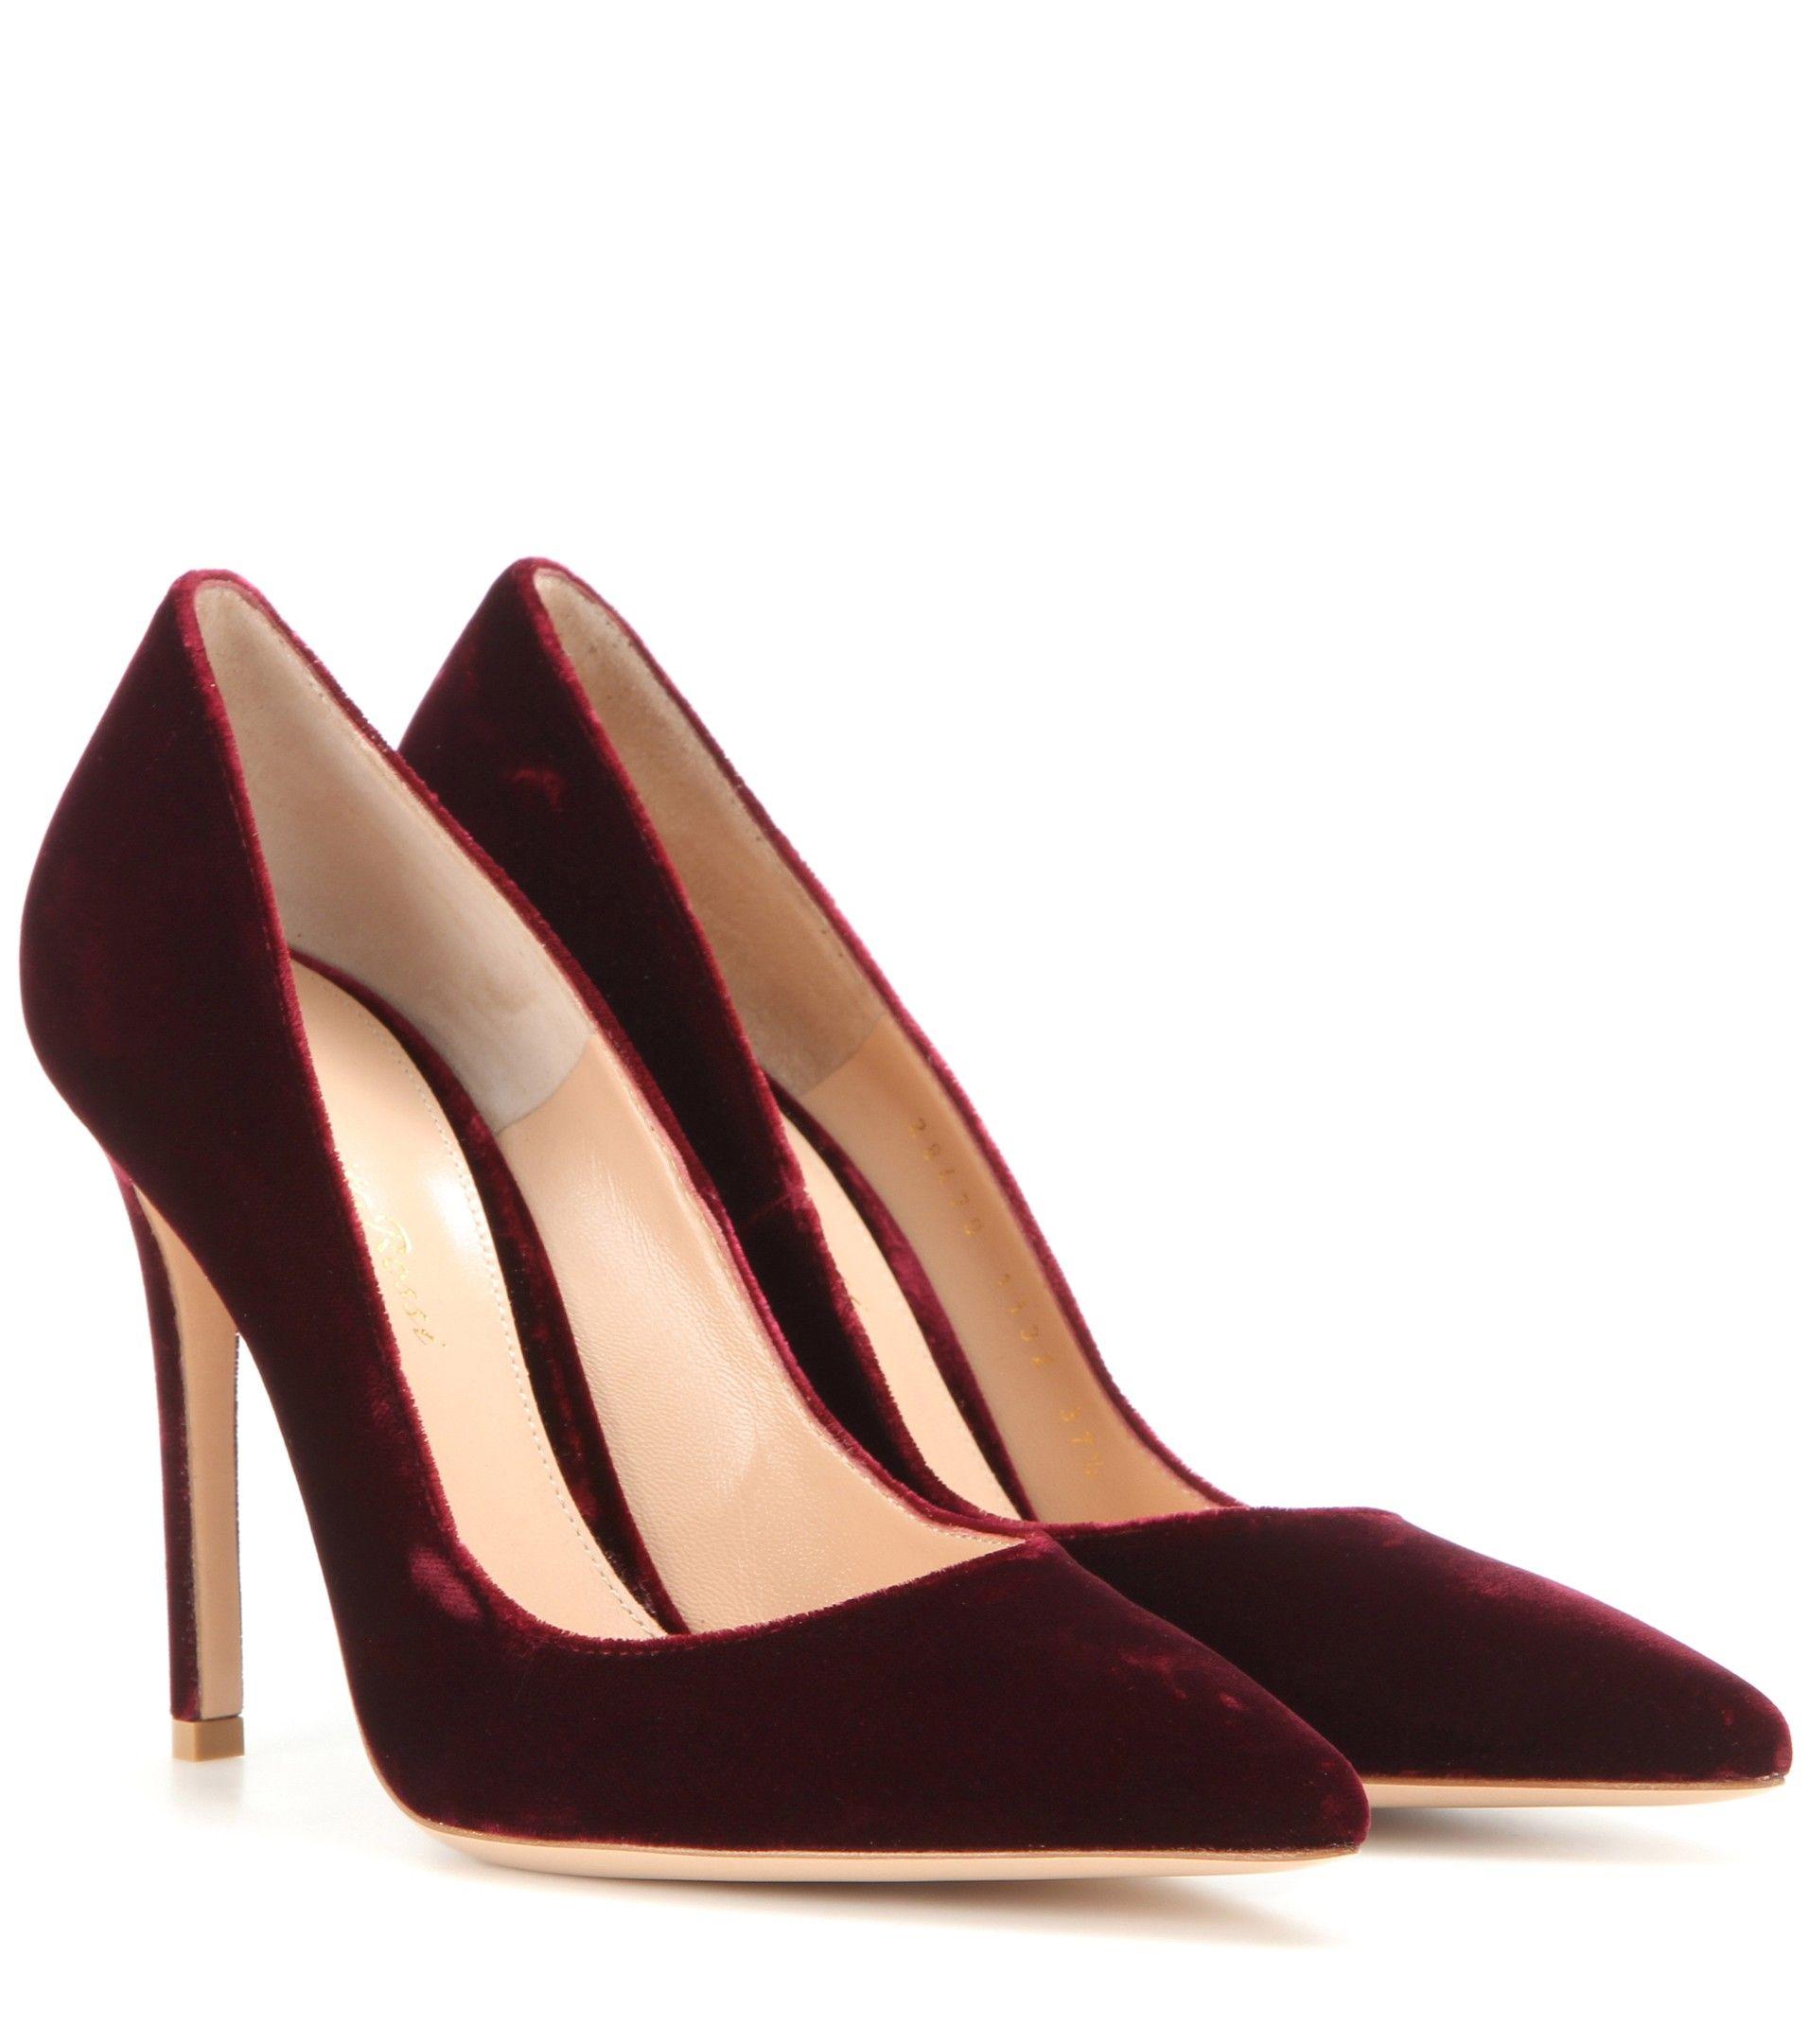 3e04cd9602c574 Escarpins en velours rouge grenat GIANVITO ROSSI | Chaussures en ...